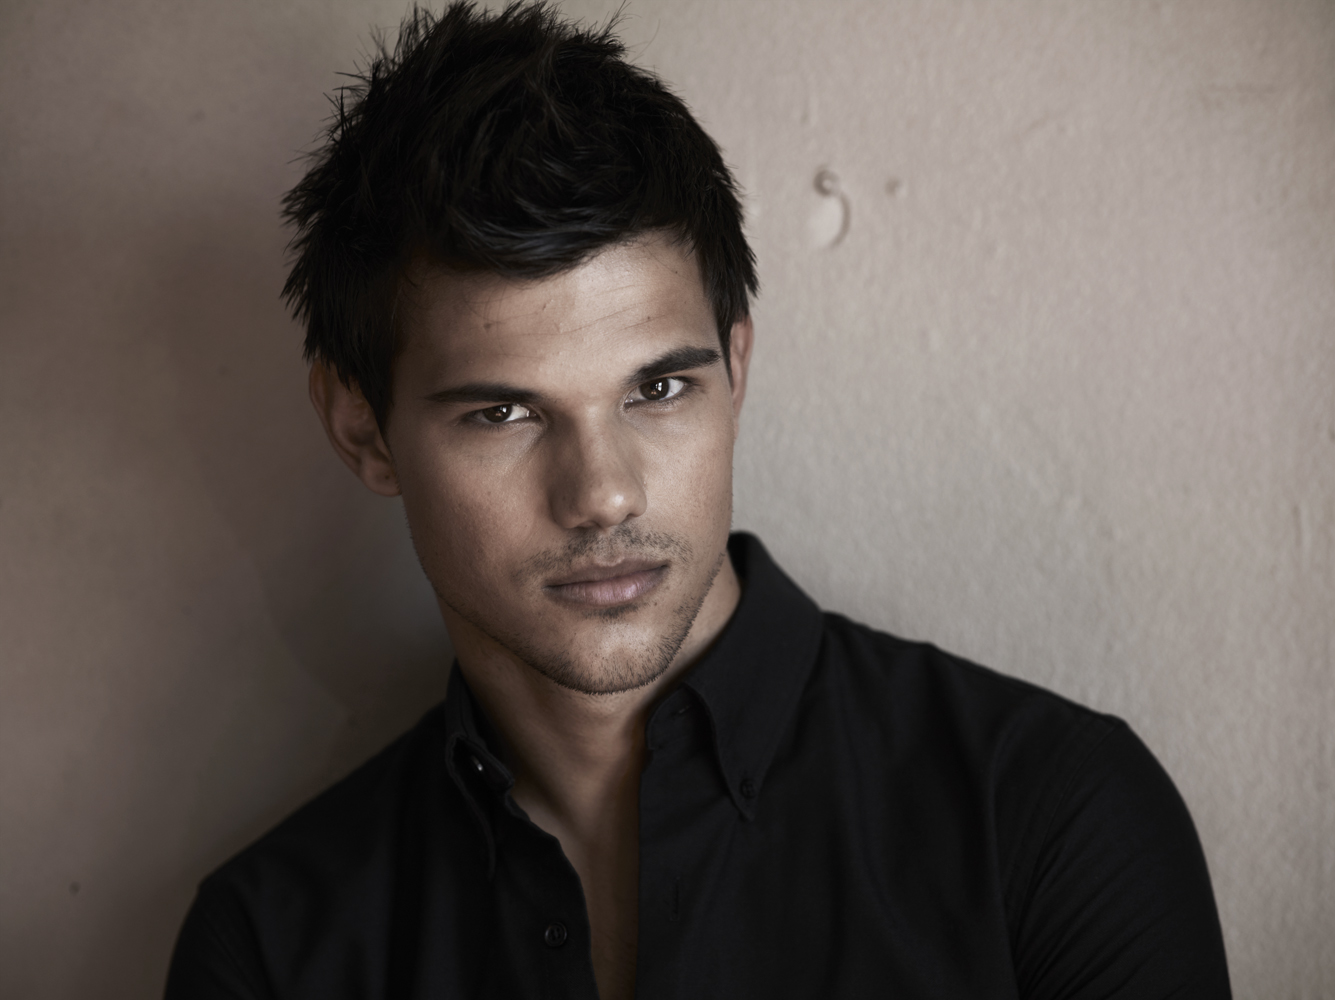 http://1.bp.blogspot.com/-UN85UkMO5xM/UAbViJlGbII/AAAAAAAAAK0/KvjqDcmlAts/s1600/Taylor-Lautner-Total-film-mag3.jpg